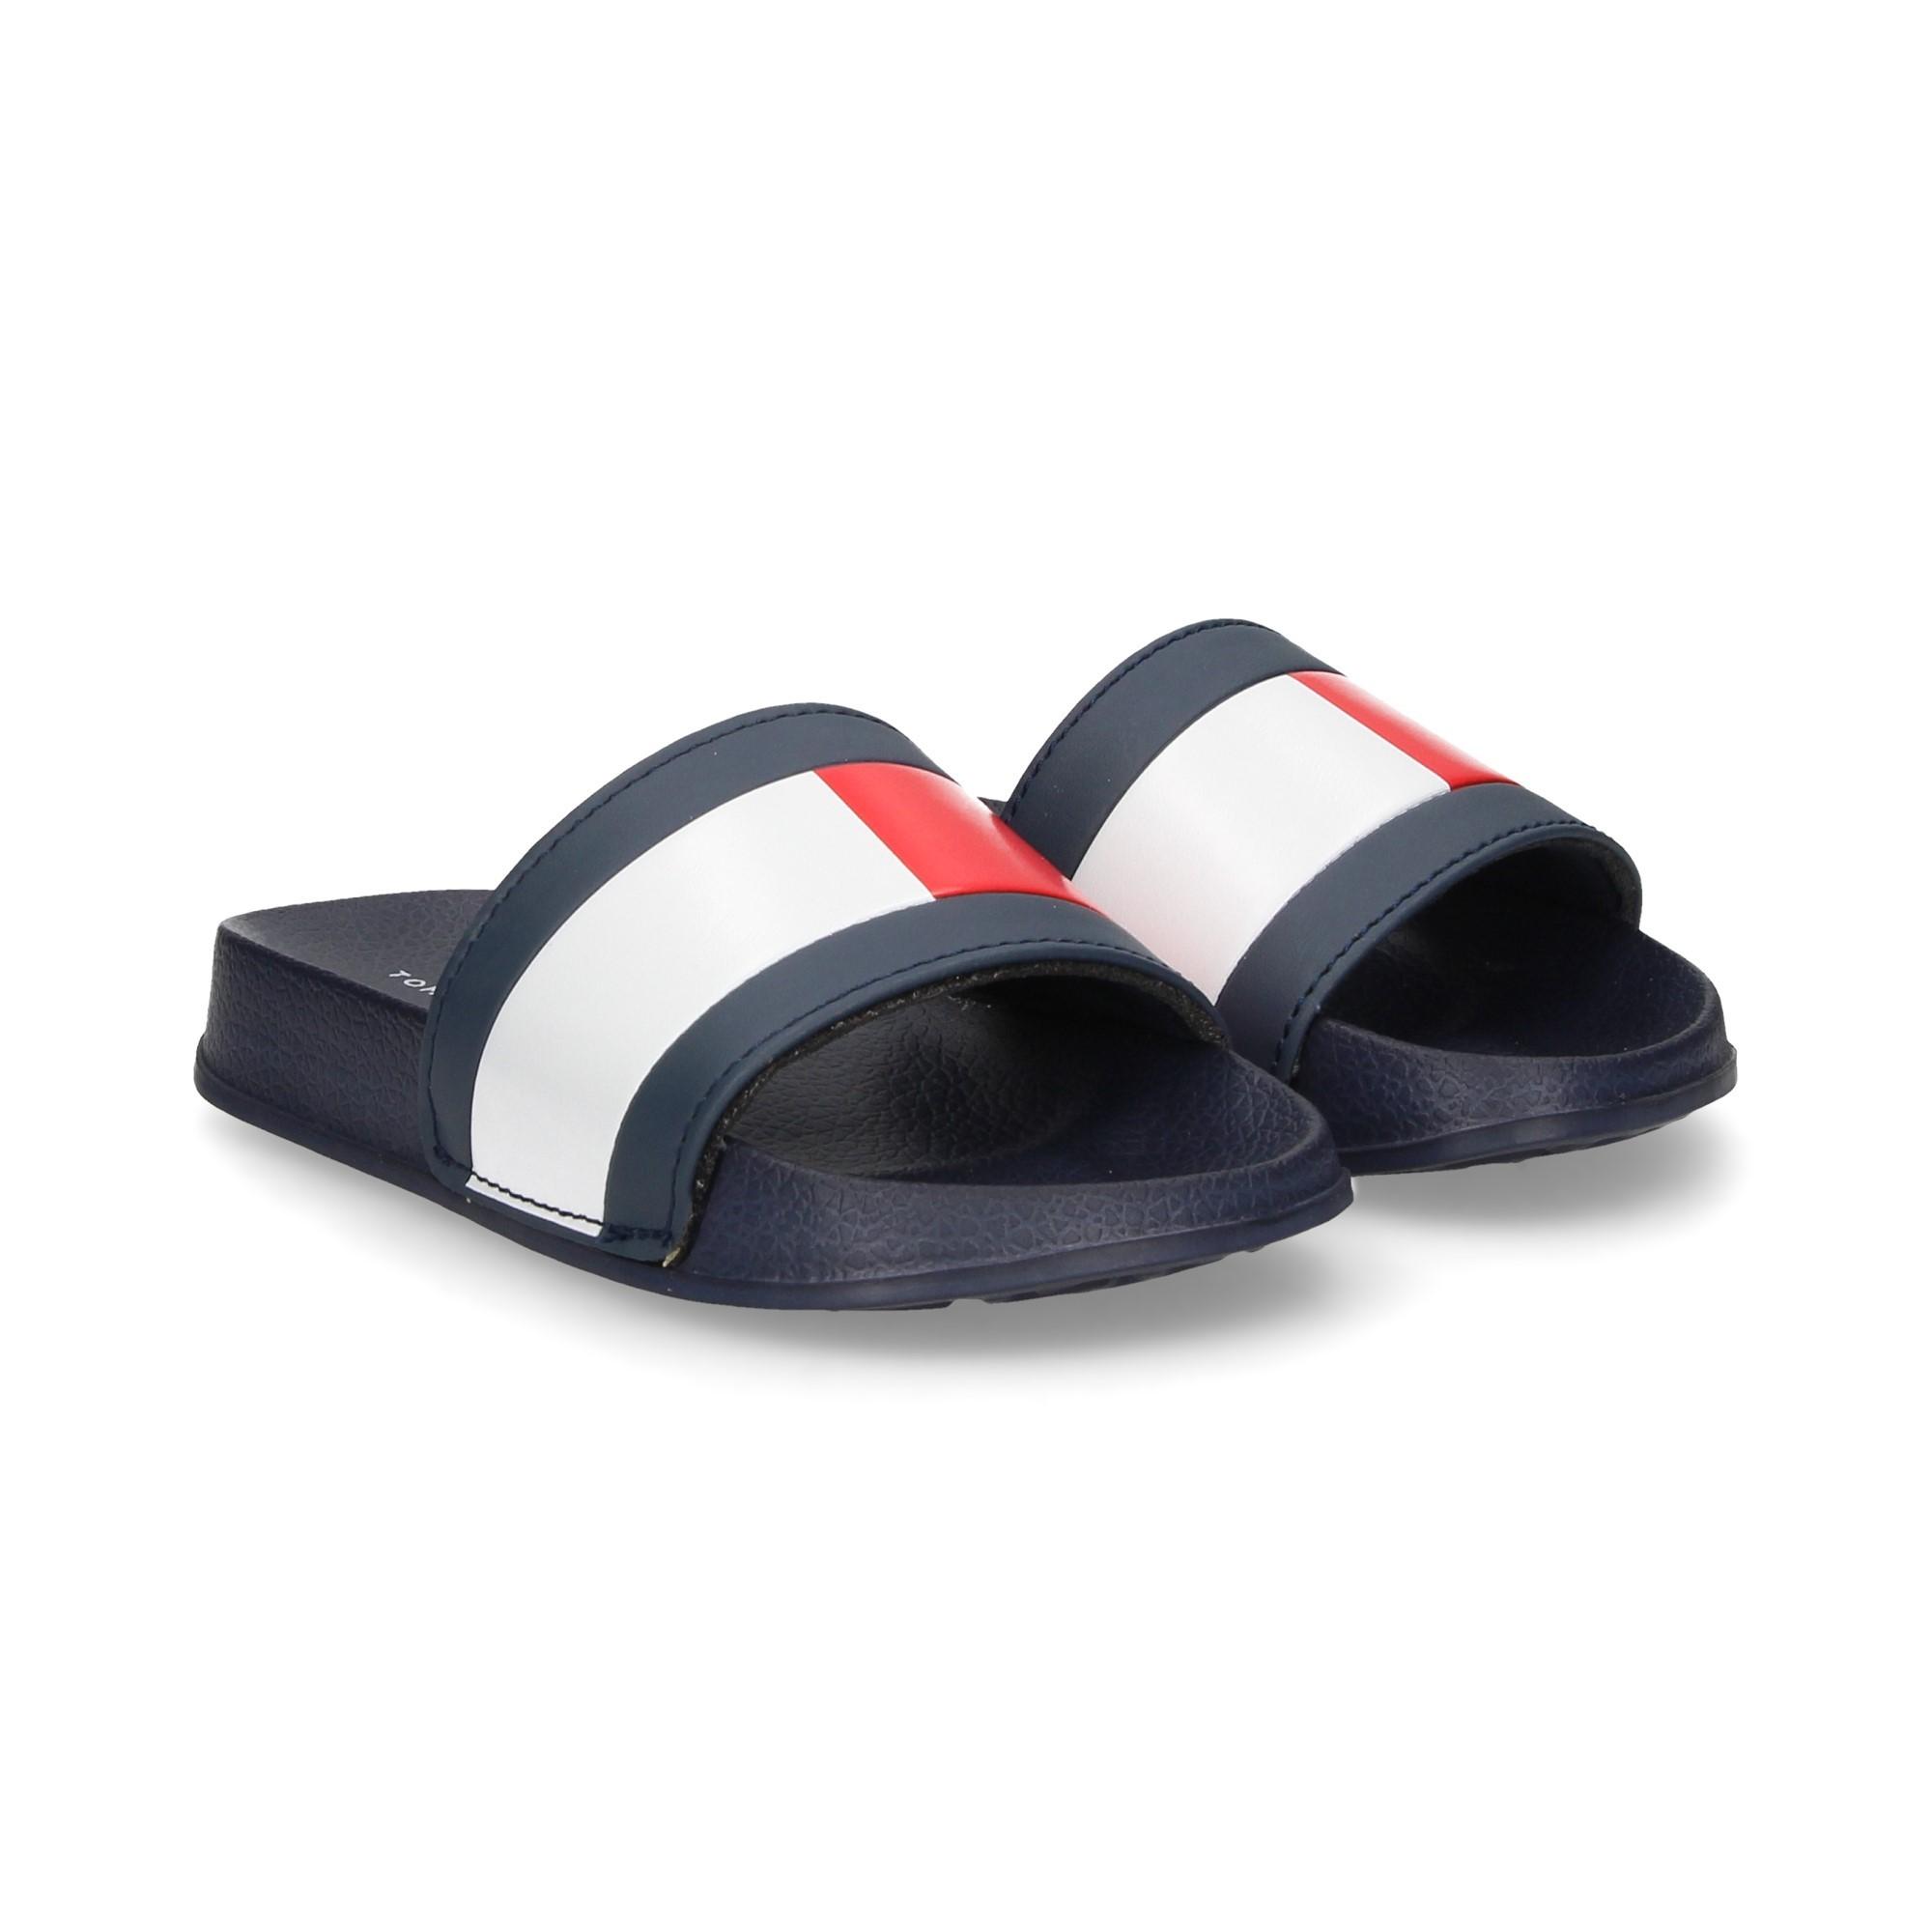 acf74bc30 TOMMY HILFIGER Girls sandals and flip flops T3B0 30227 004 AZUL